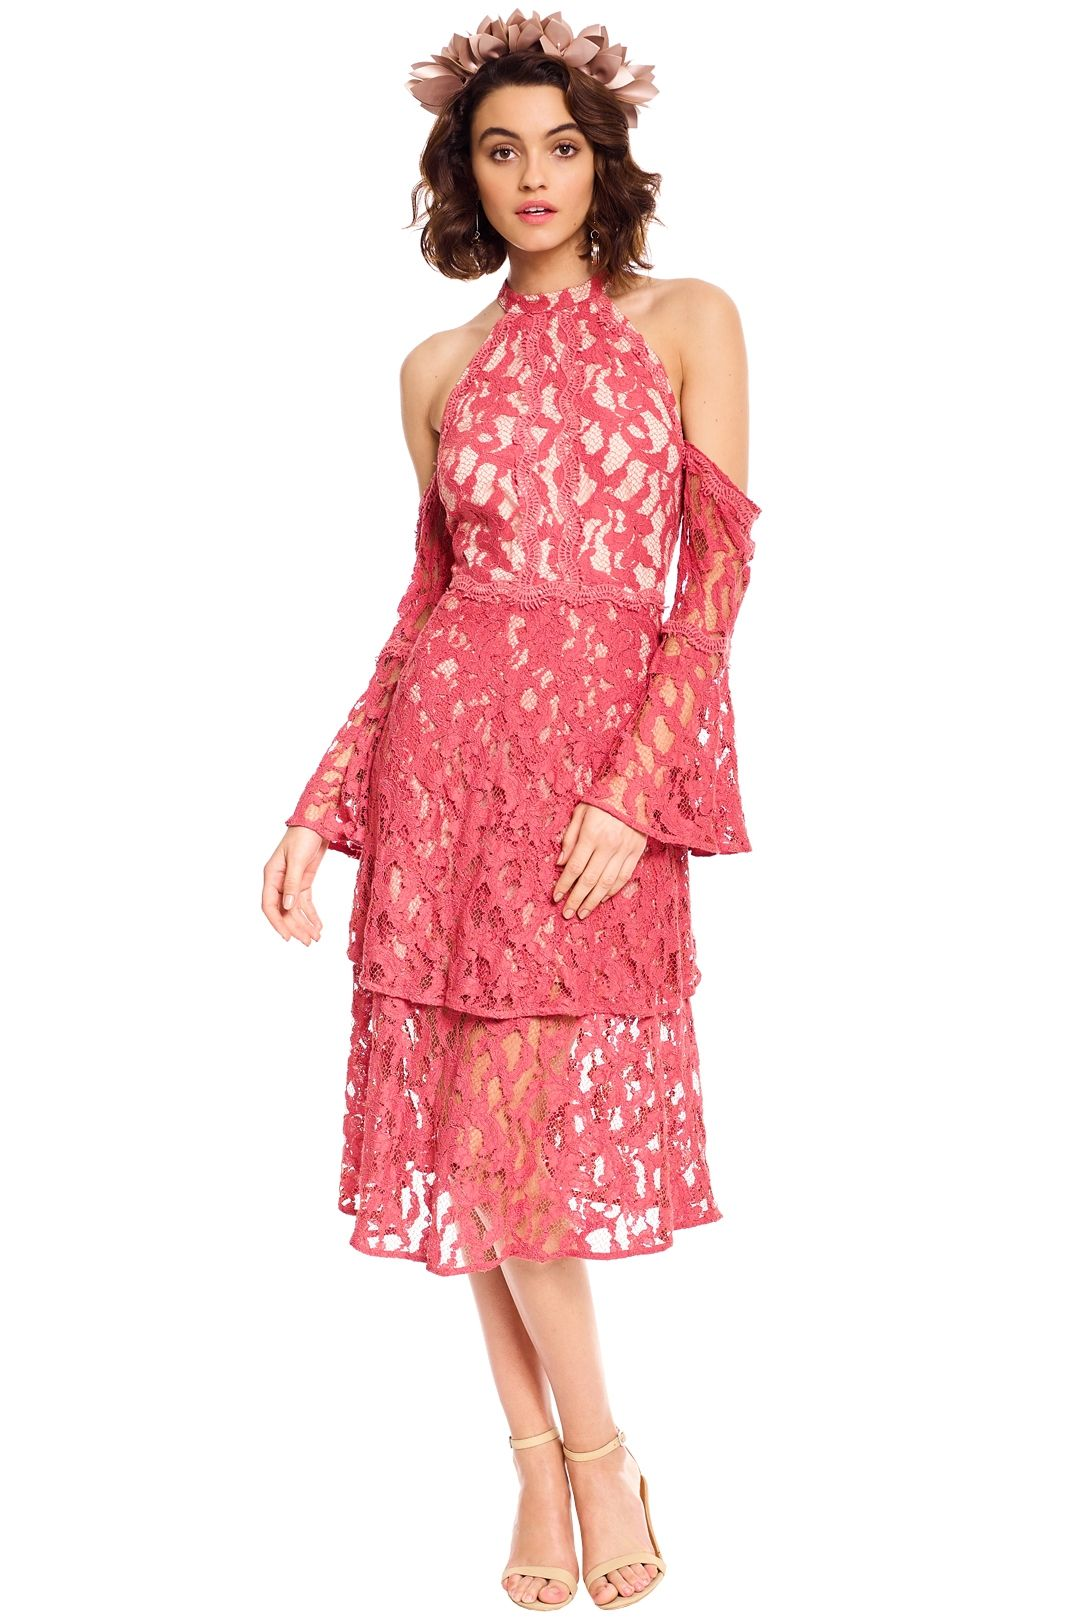 Talulah - Genre Halter Dress - Coral Lace - Front